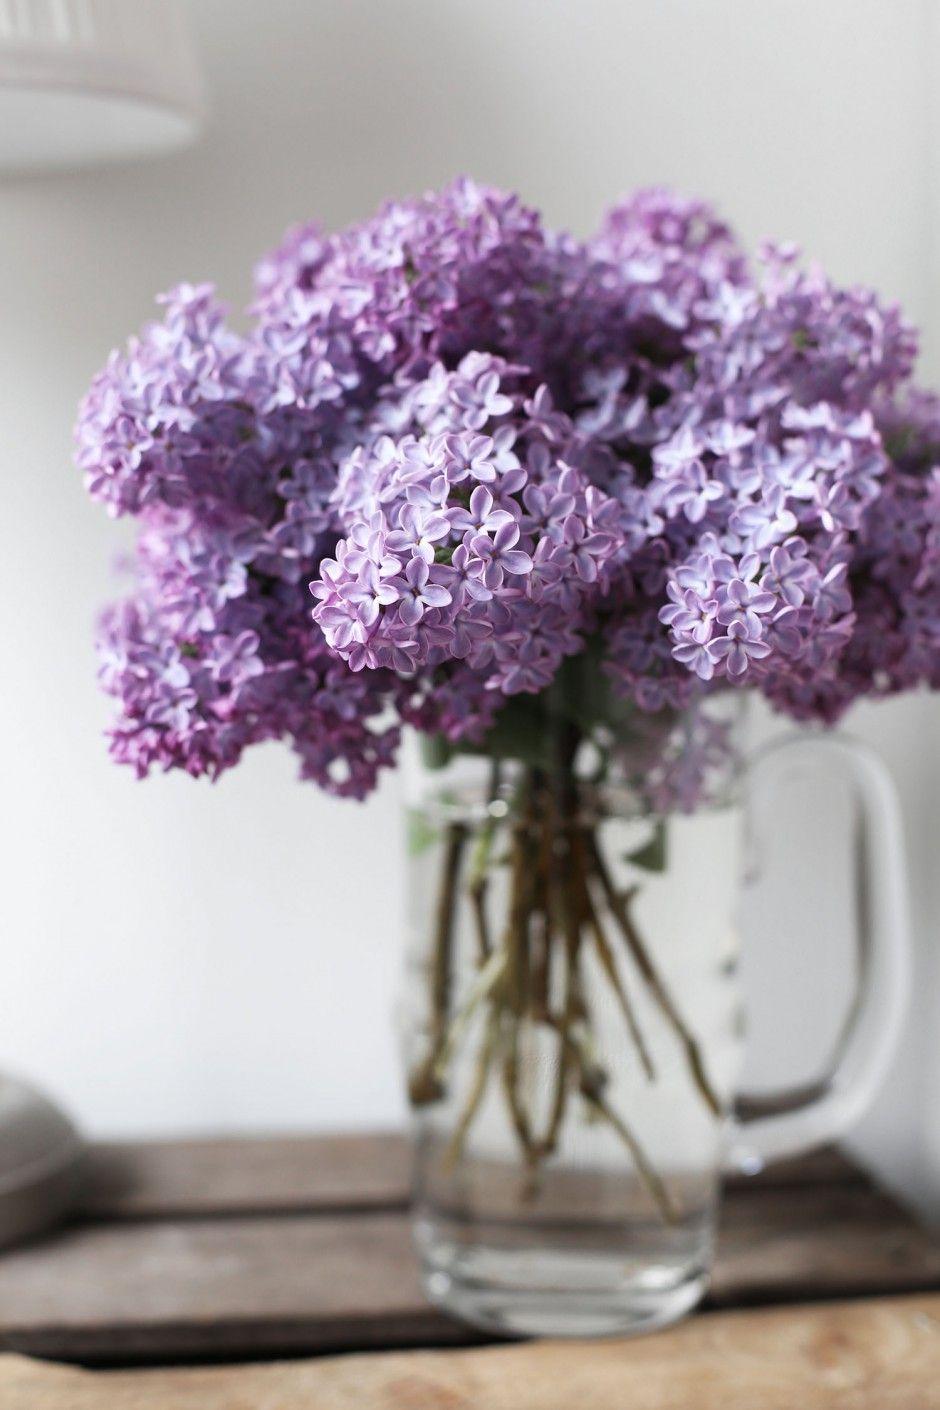 Make It Last Lilac Wine In 2020 Lilac Flowers Pretty Flowers Beautiful Flowers